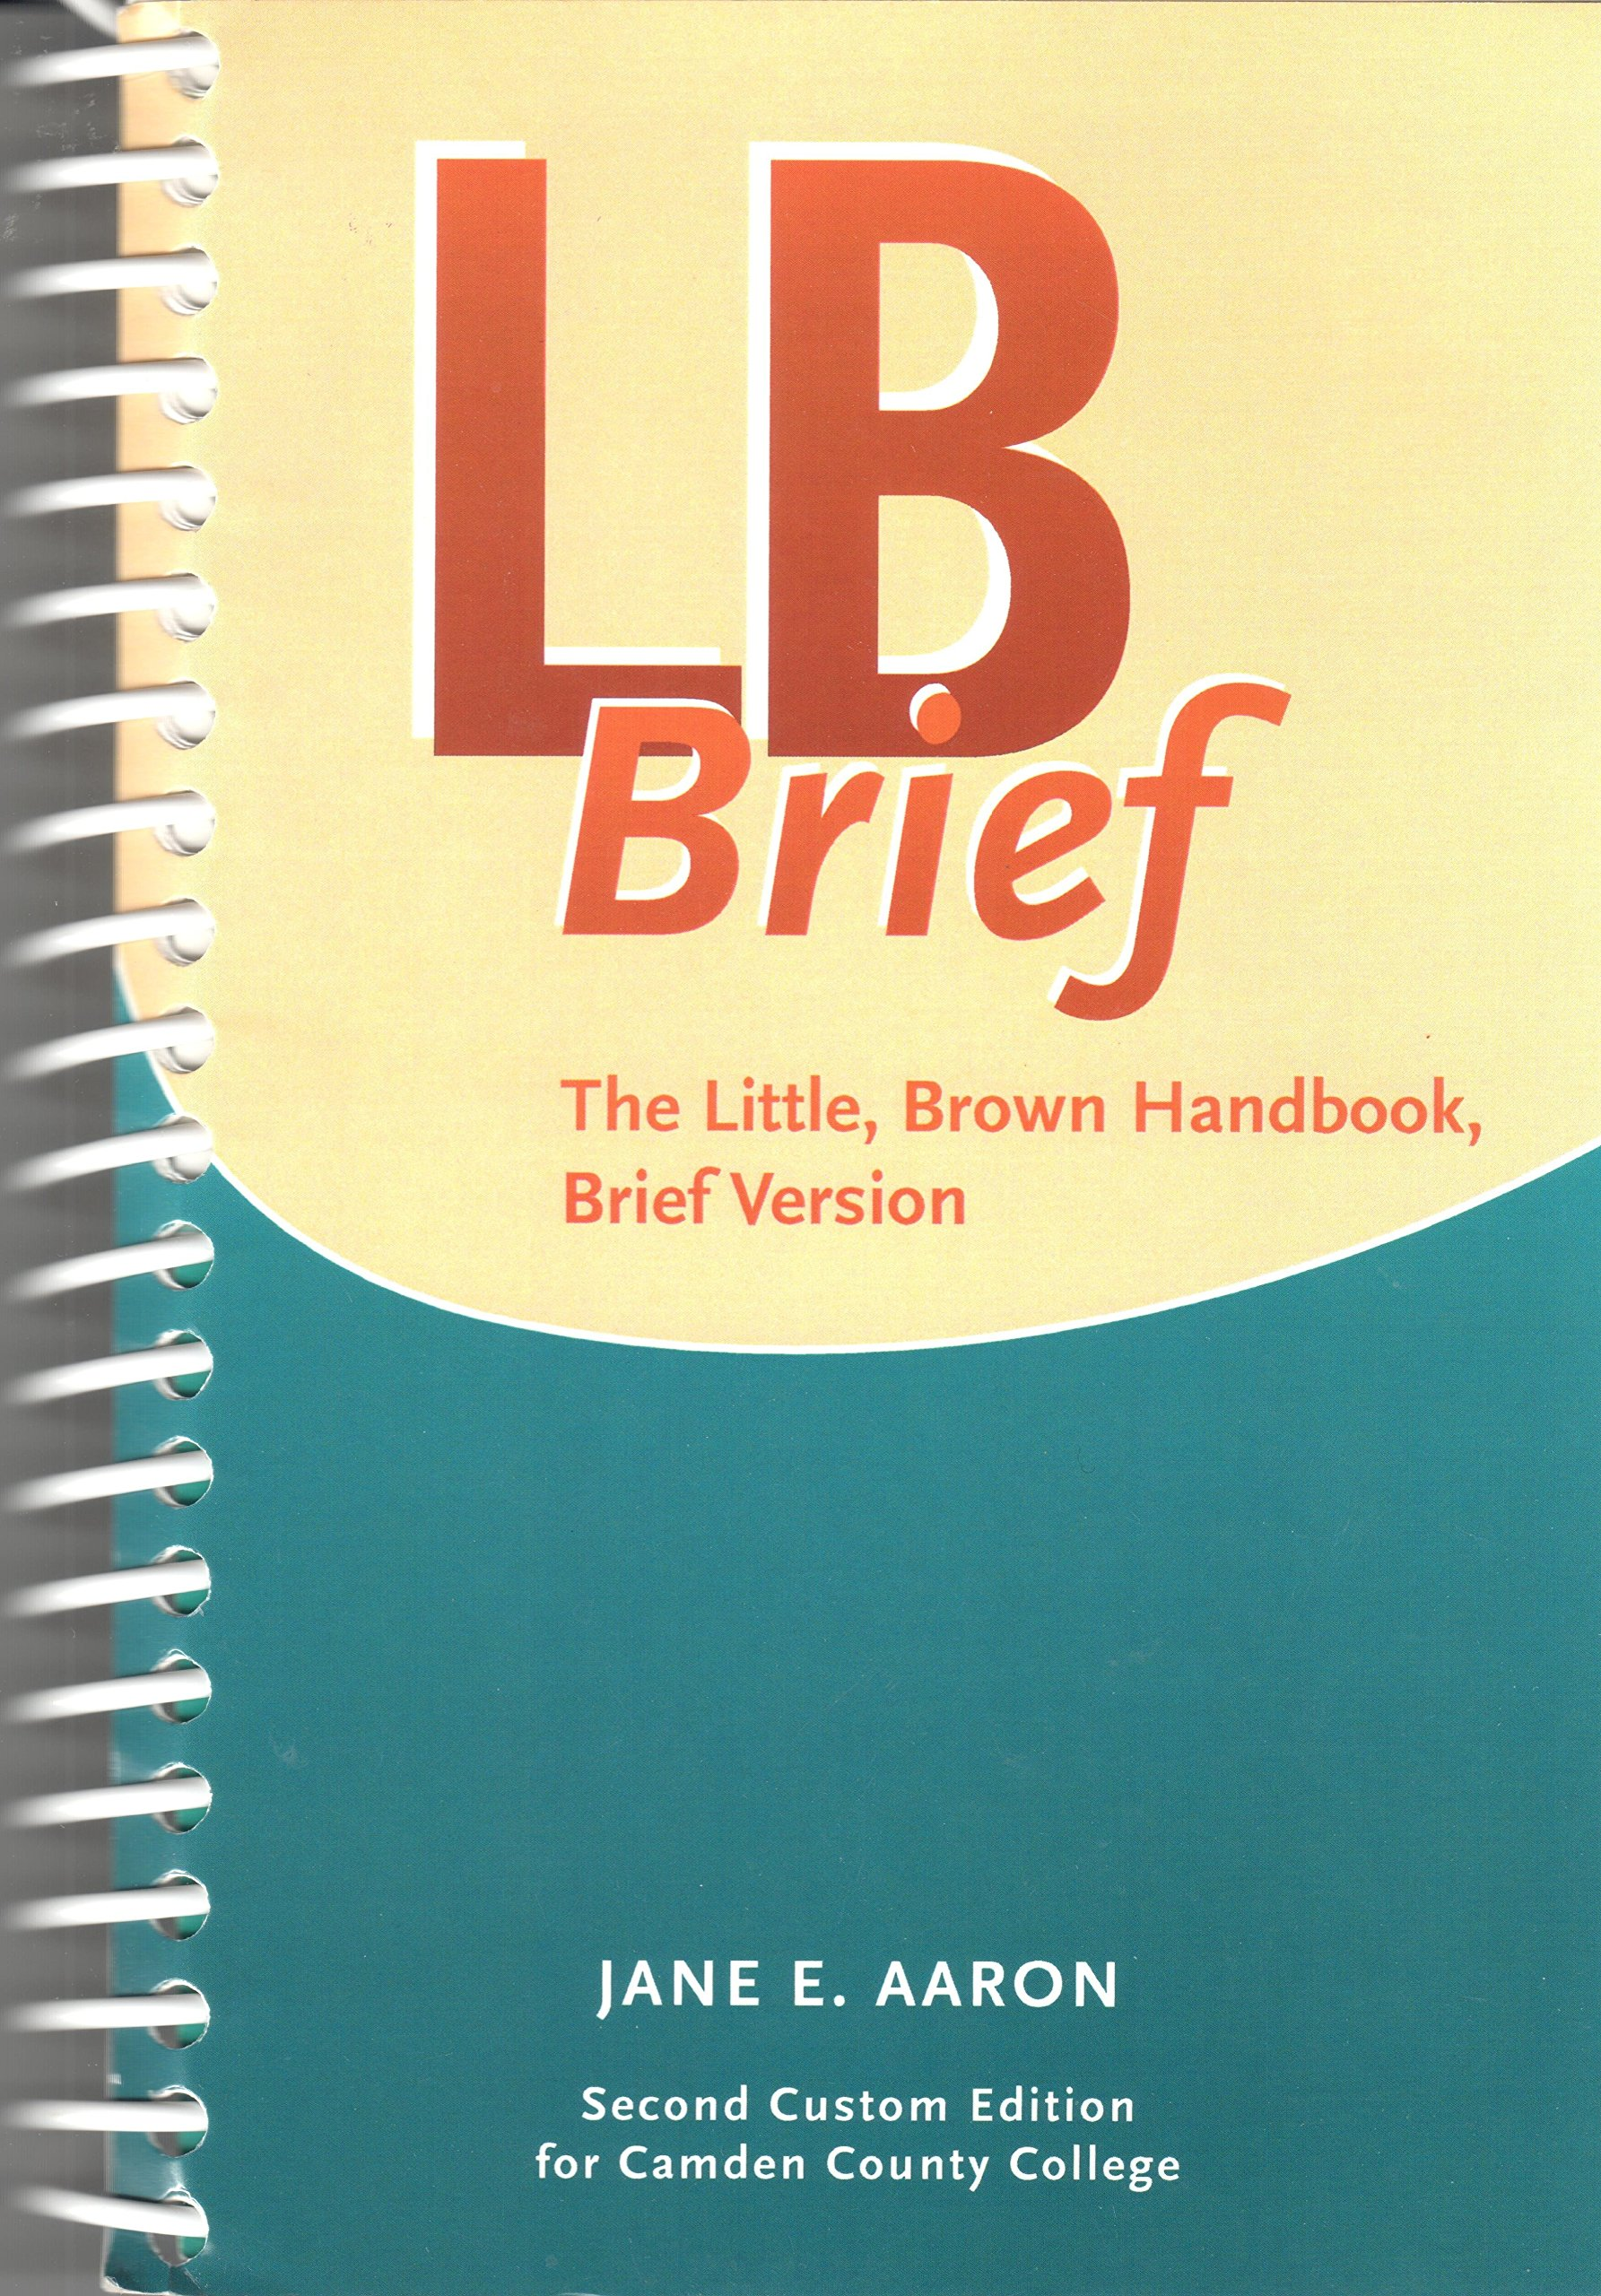 LB Brief: The Little, Brown Handbook, Brief Version, 2nd custom edition for  Camden County College: Jane E. Aaron: 9781256754640: Amazon.com: Books